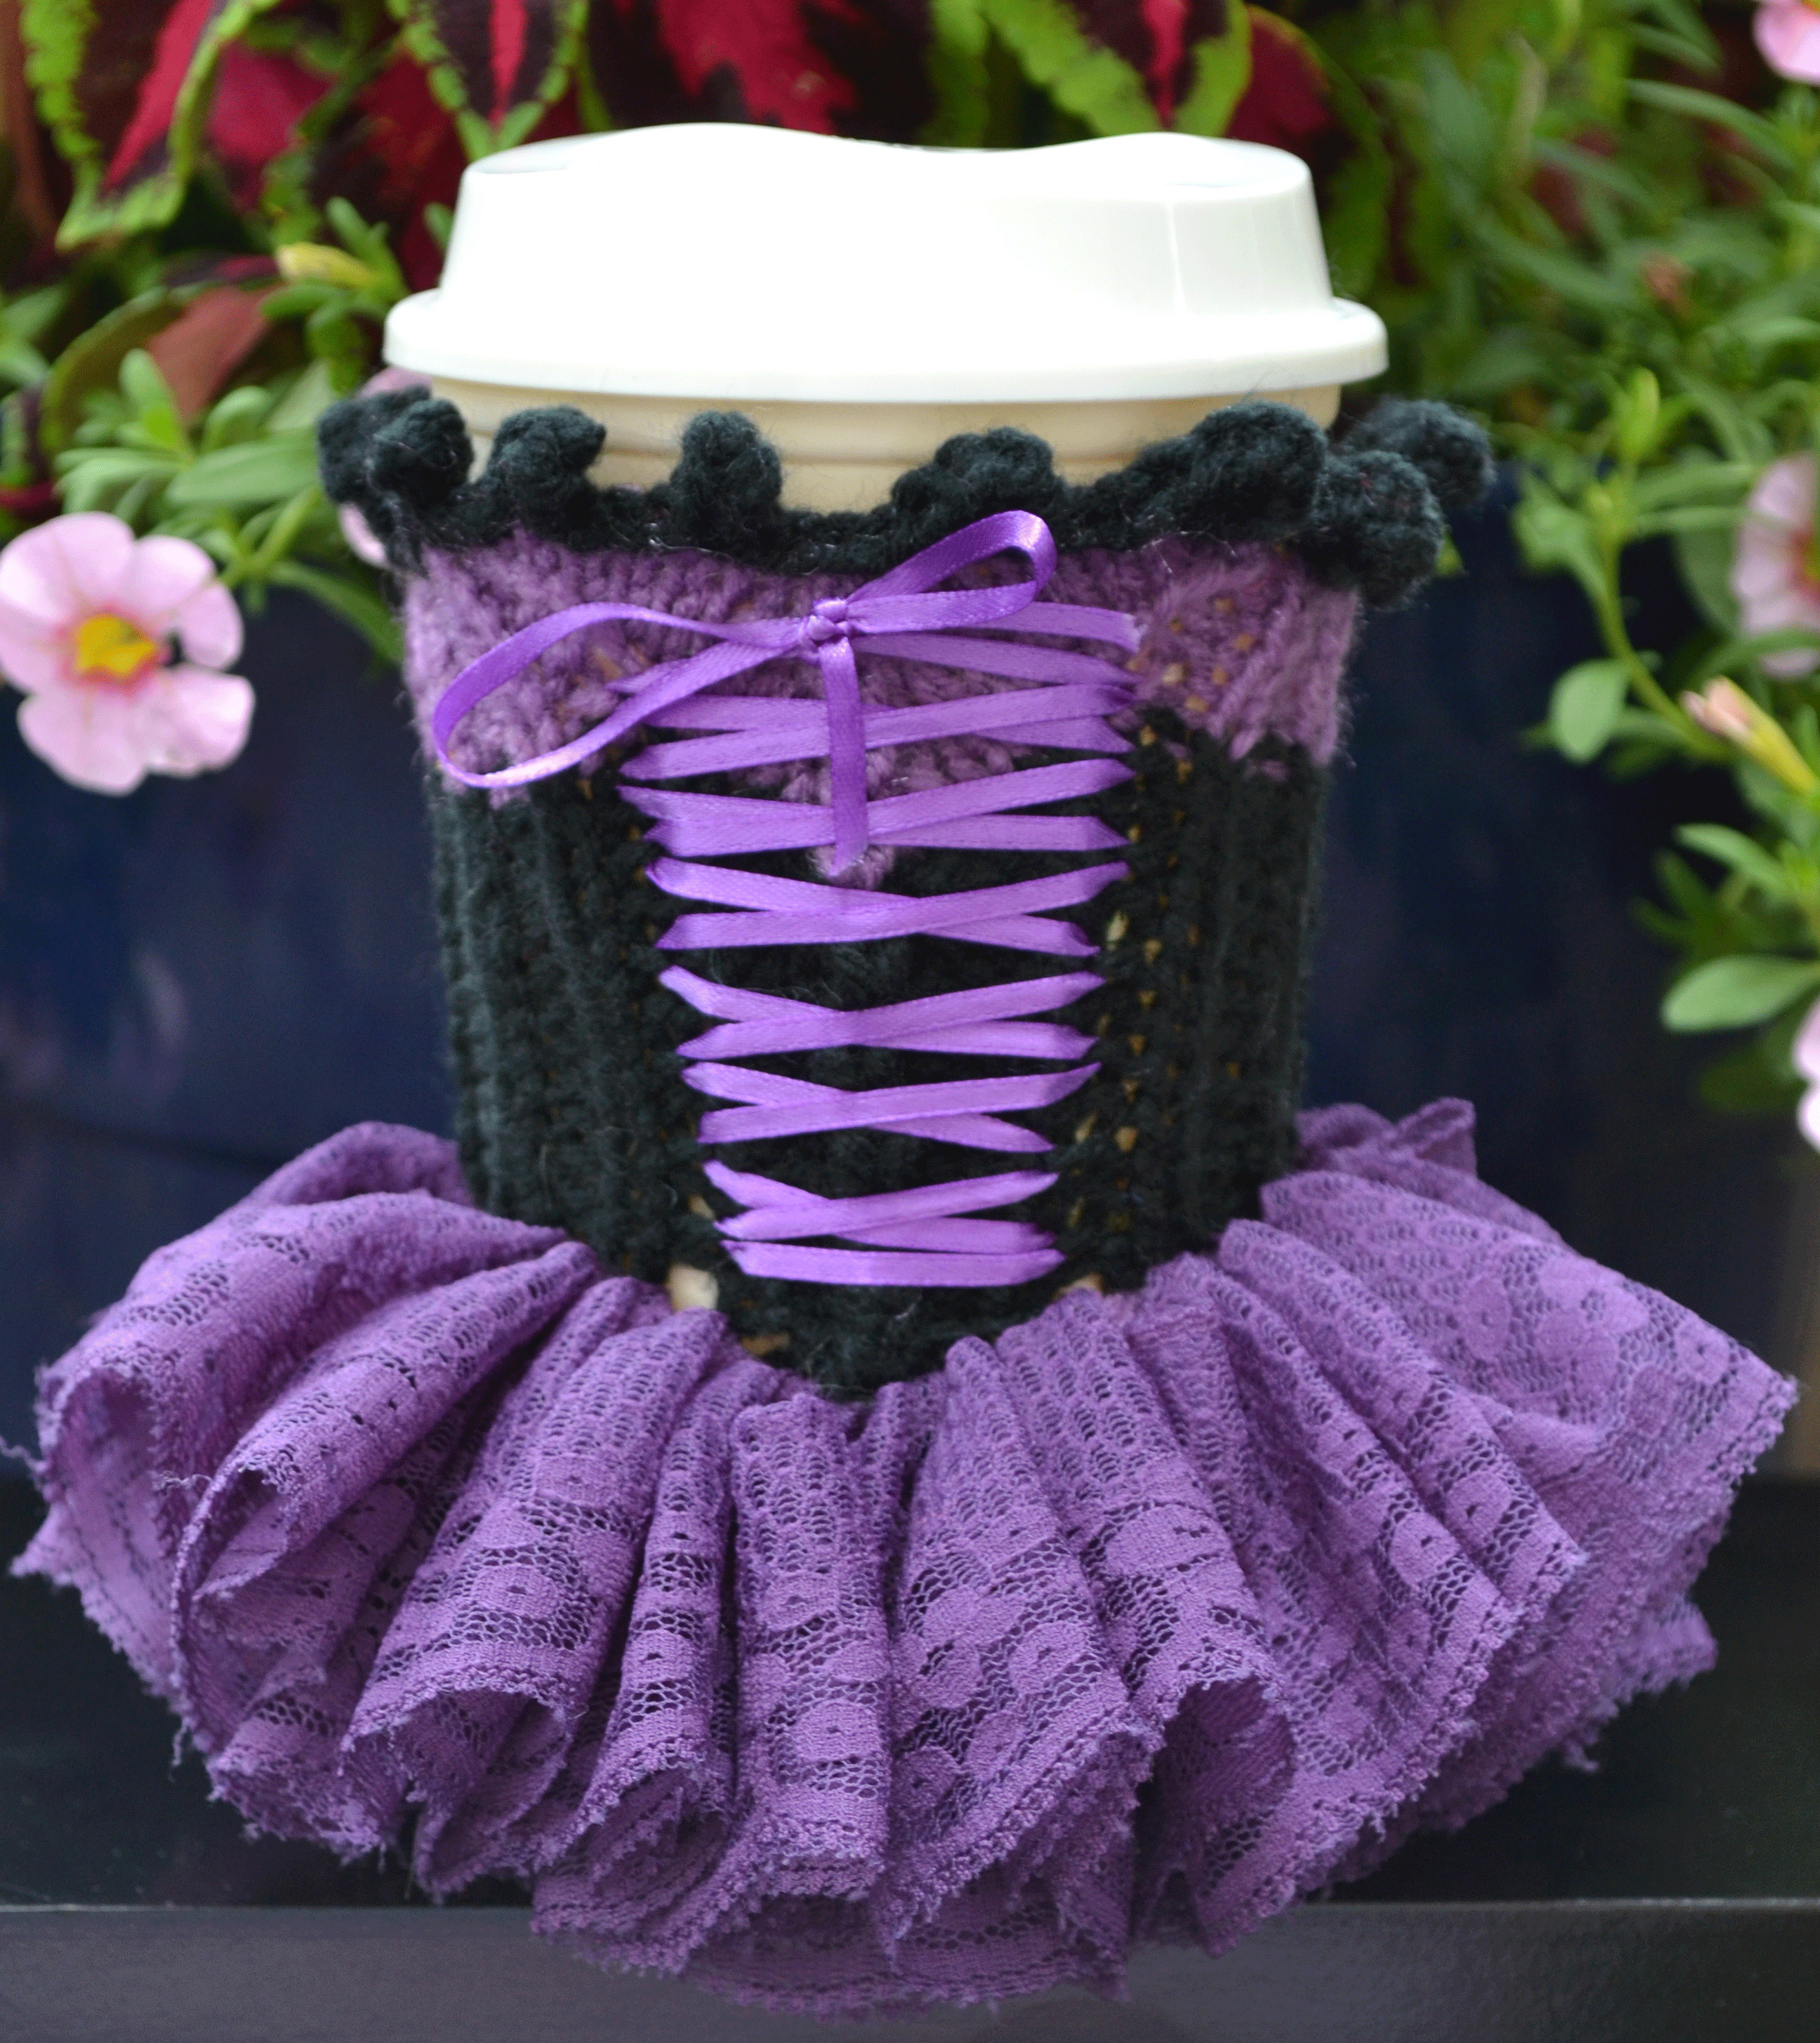 https://0201.nccdn.net/1_2/000/000/091/866/PurpleBlackCuptutu-2640x2964.jpg